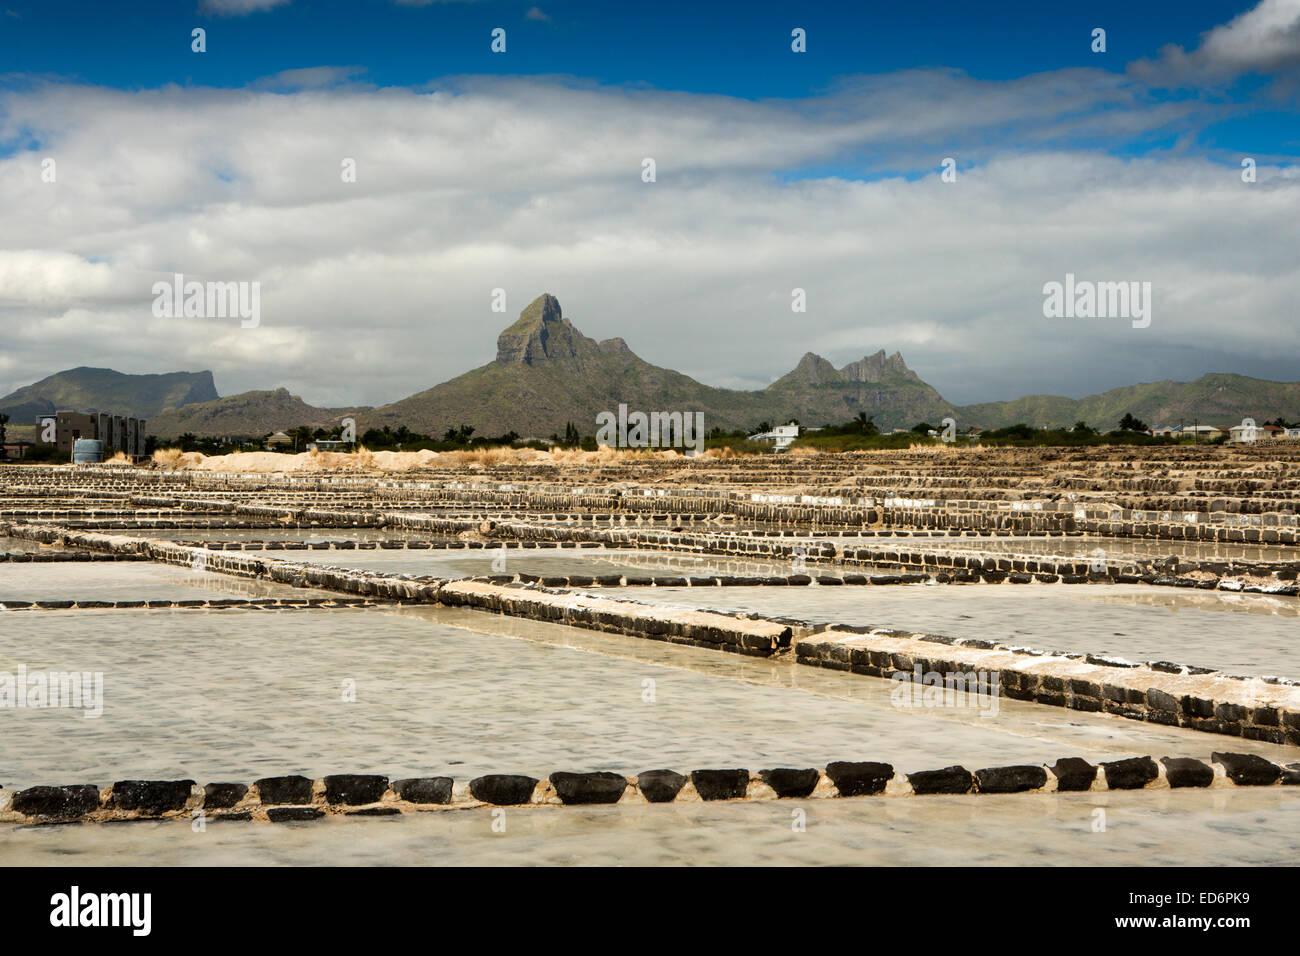 Mauritius, Tamarin, Montagne du Rempart behind salt pans - Stock Image